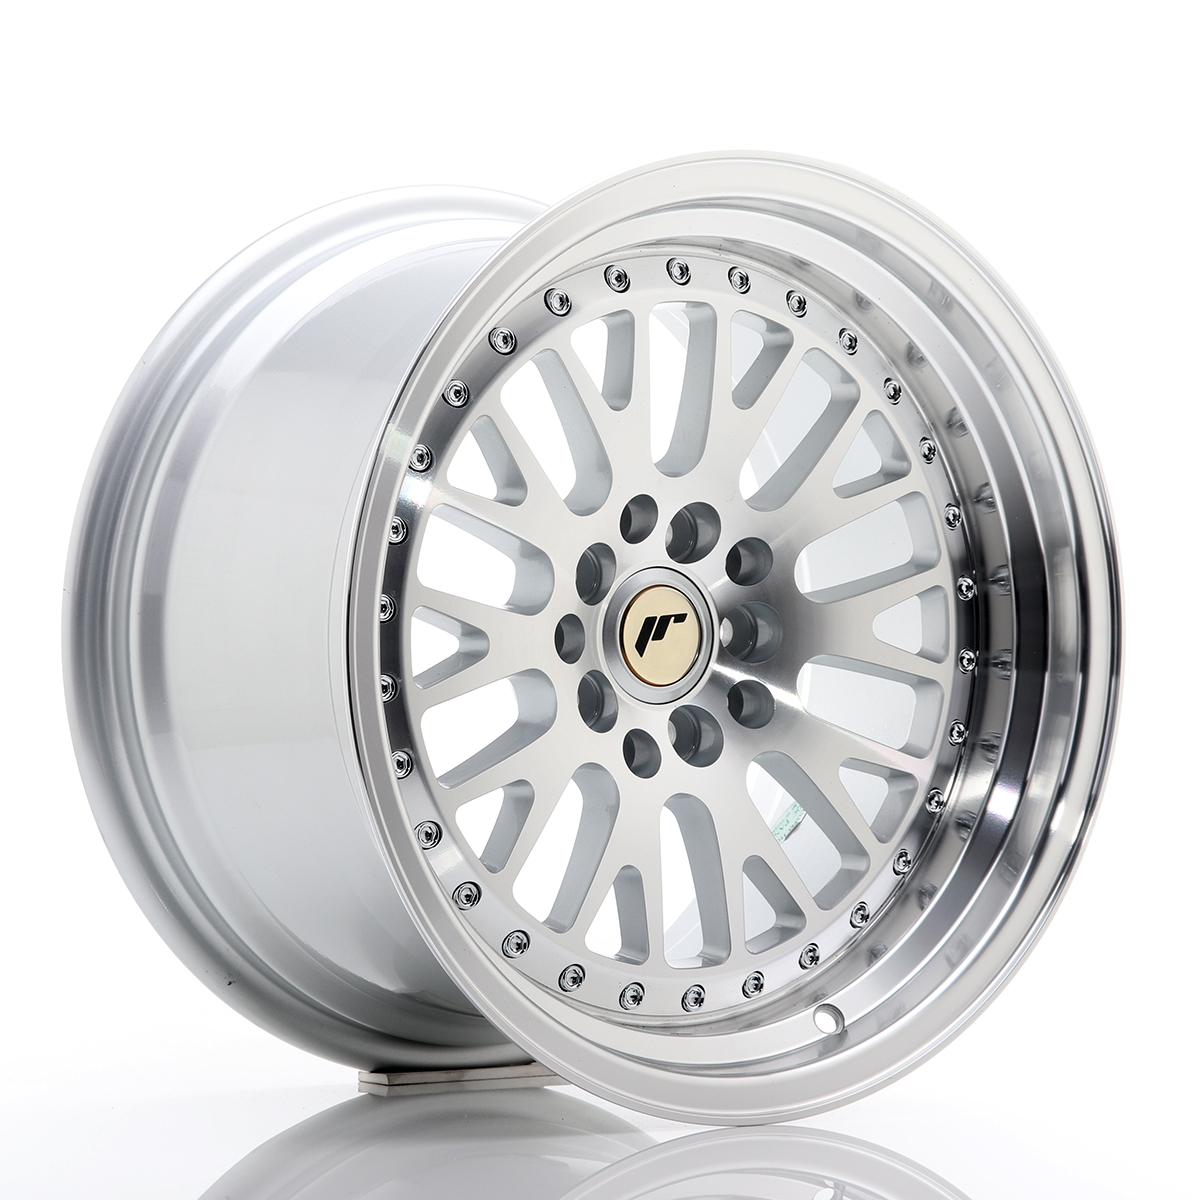 Japan Racing JR Wheels JR10 16x9 ET20 5x100 5x114.3 Silver ...